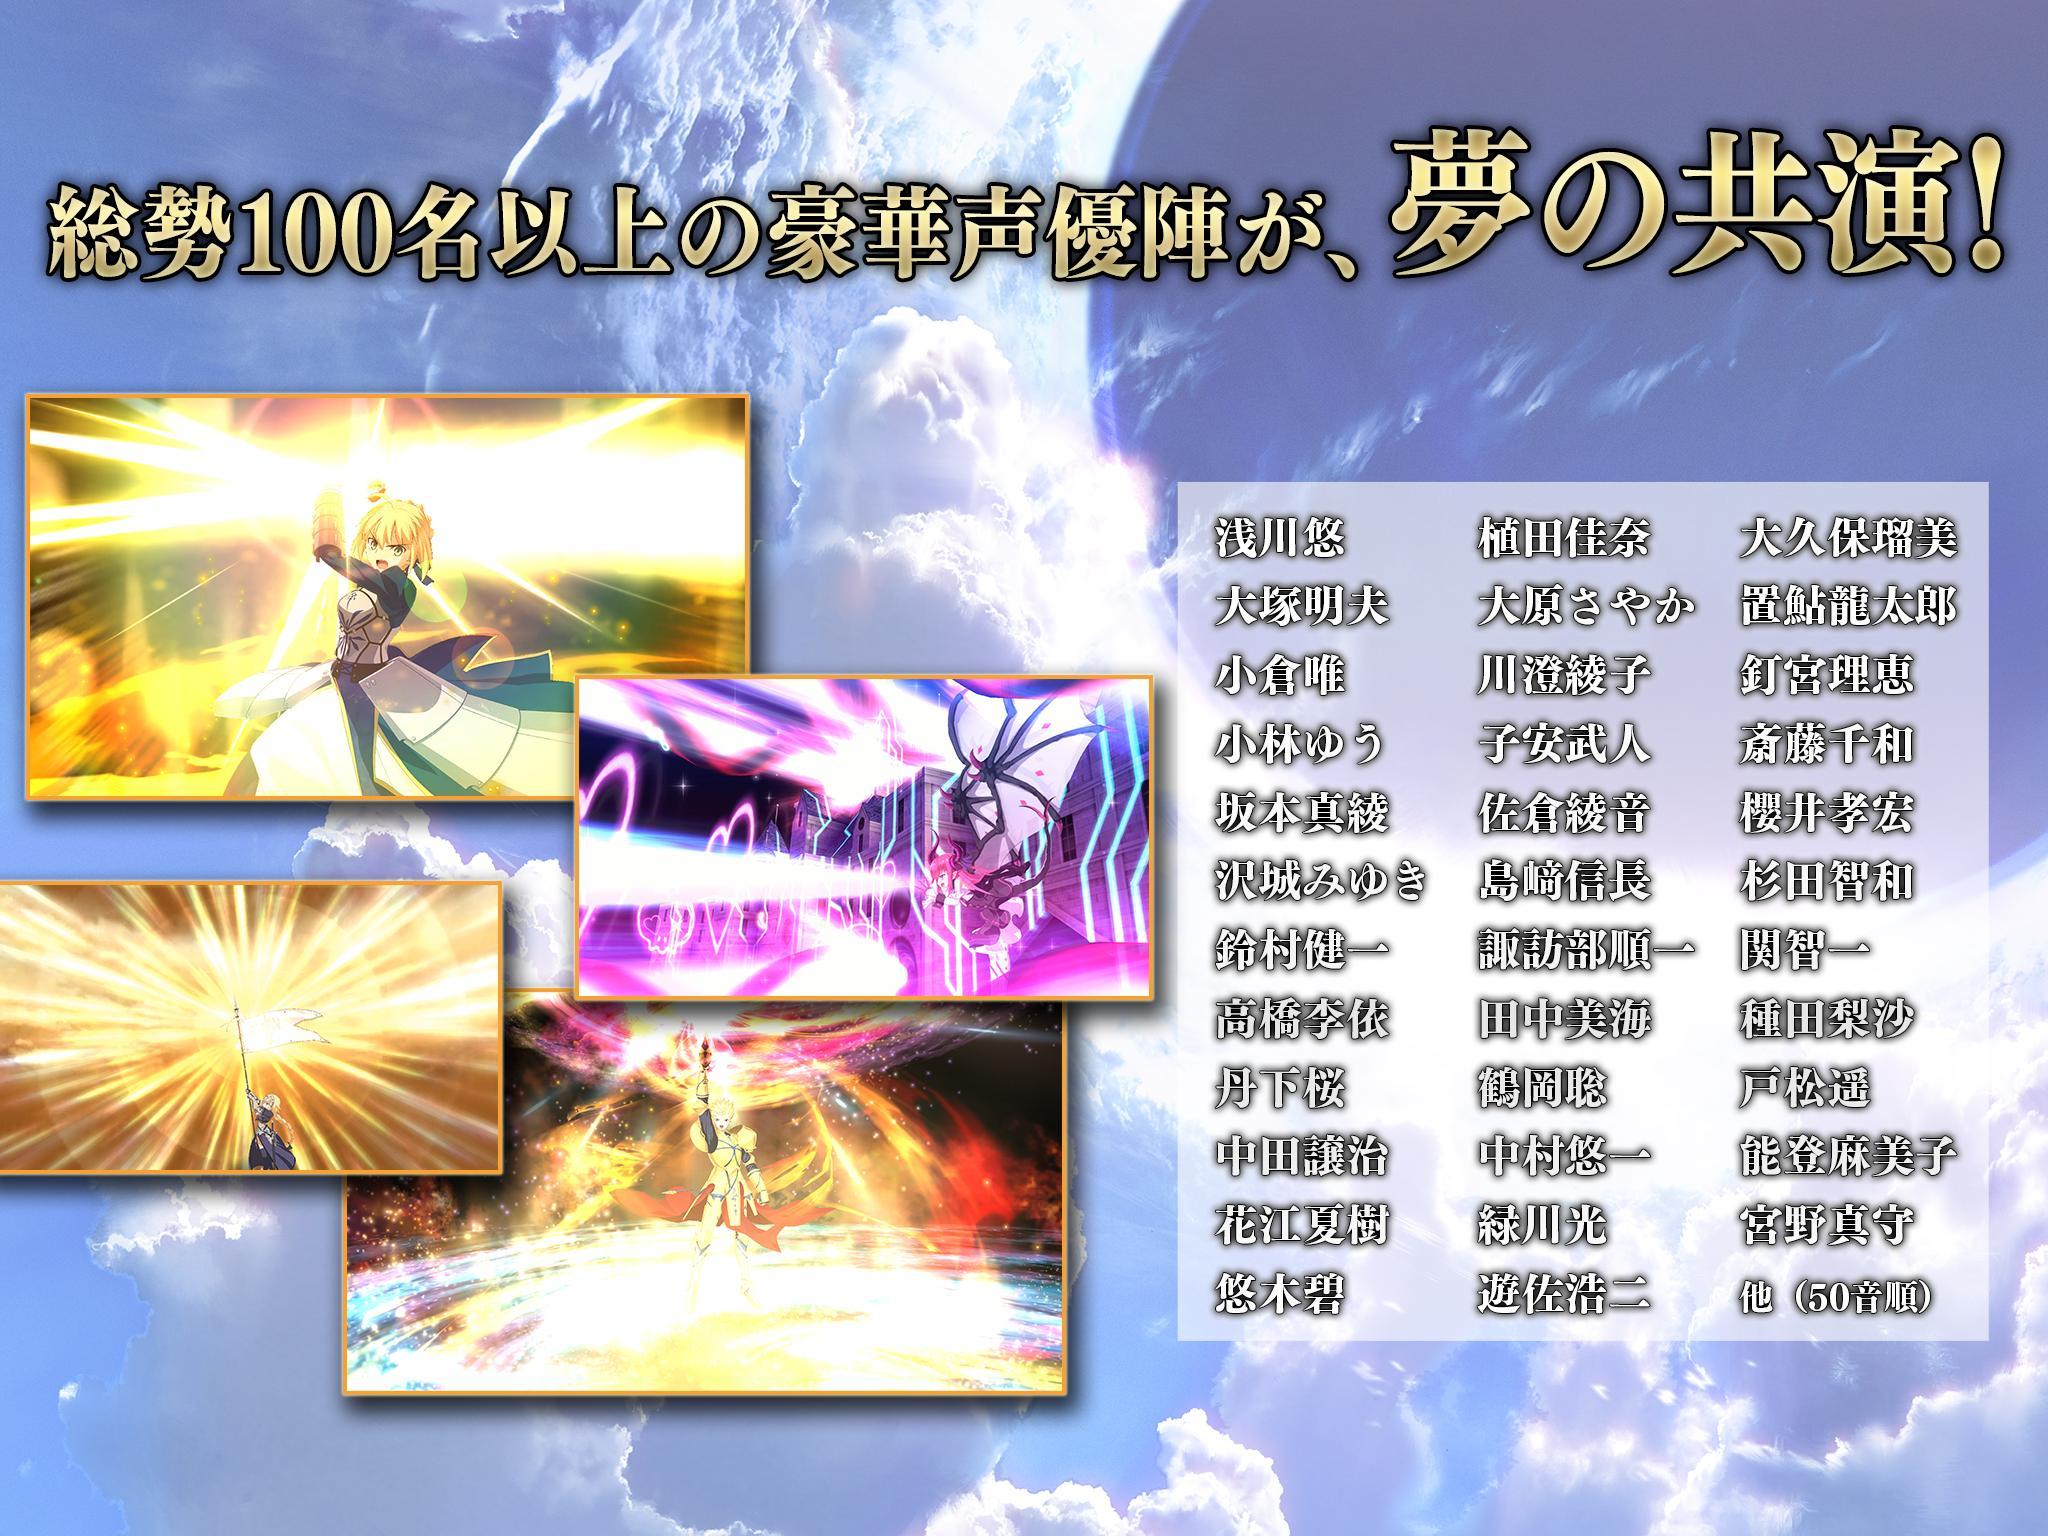 Android 用の Fate Grand Order Apk をダウンロード